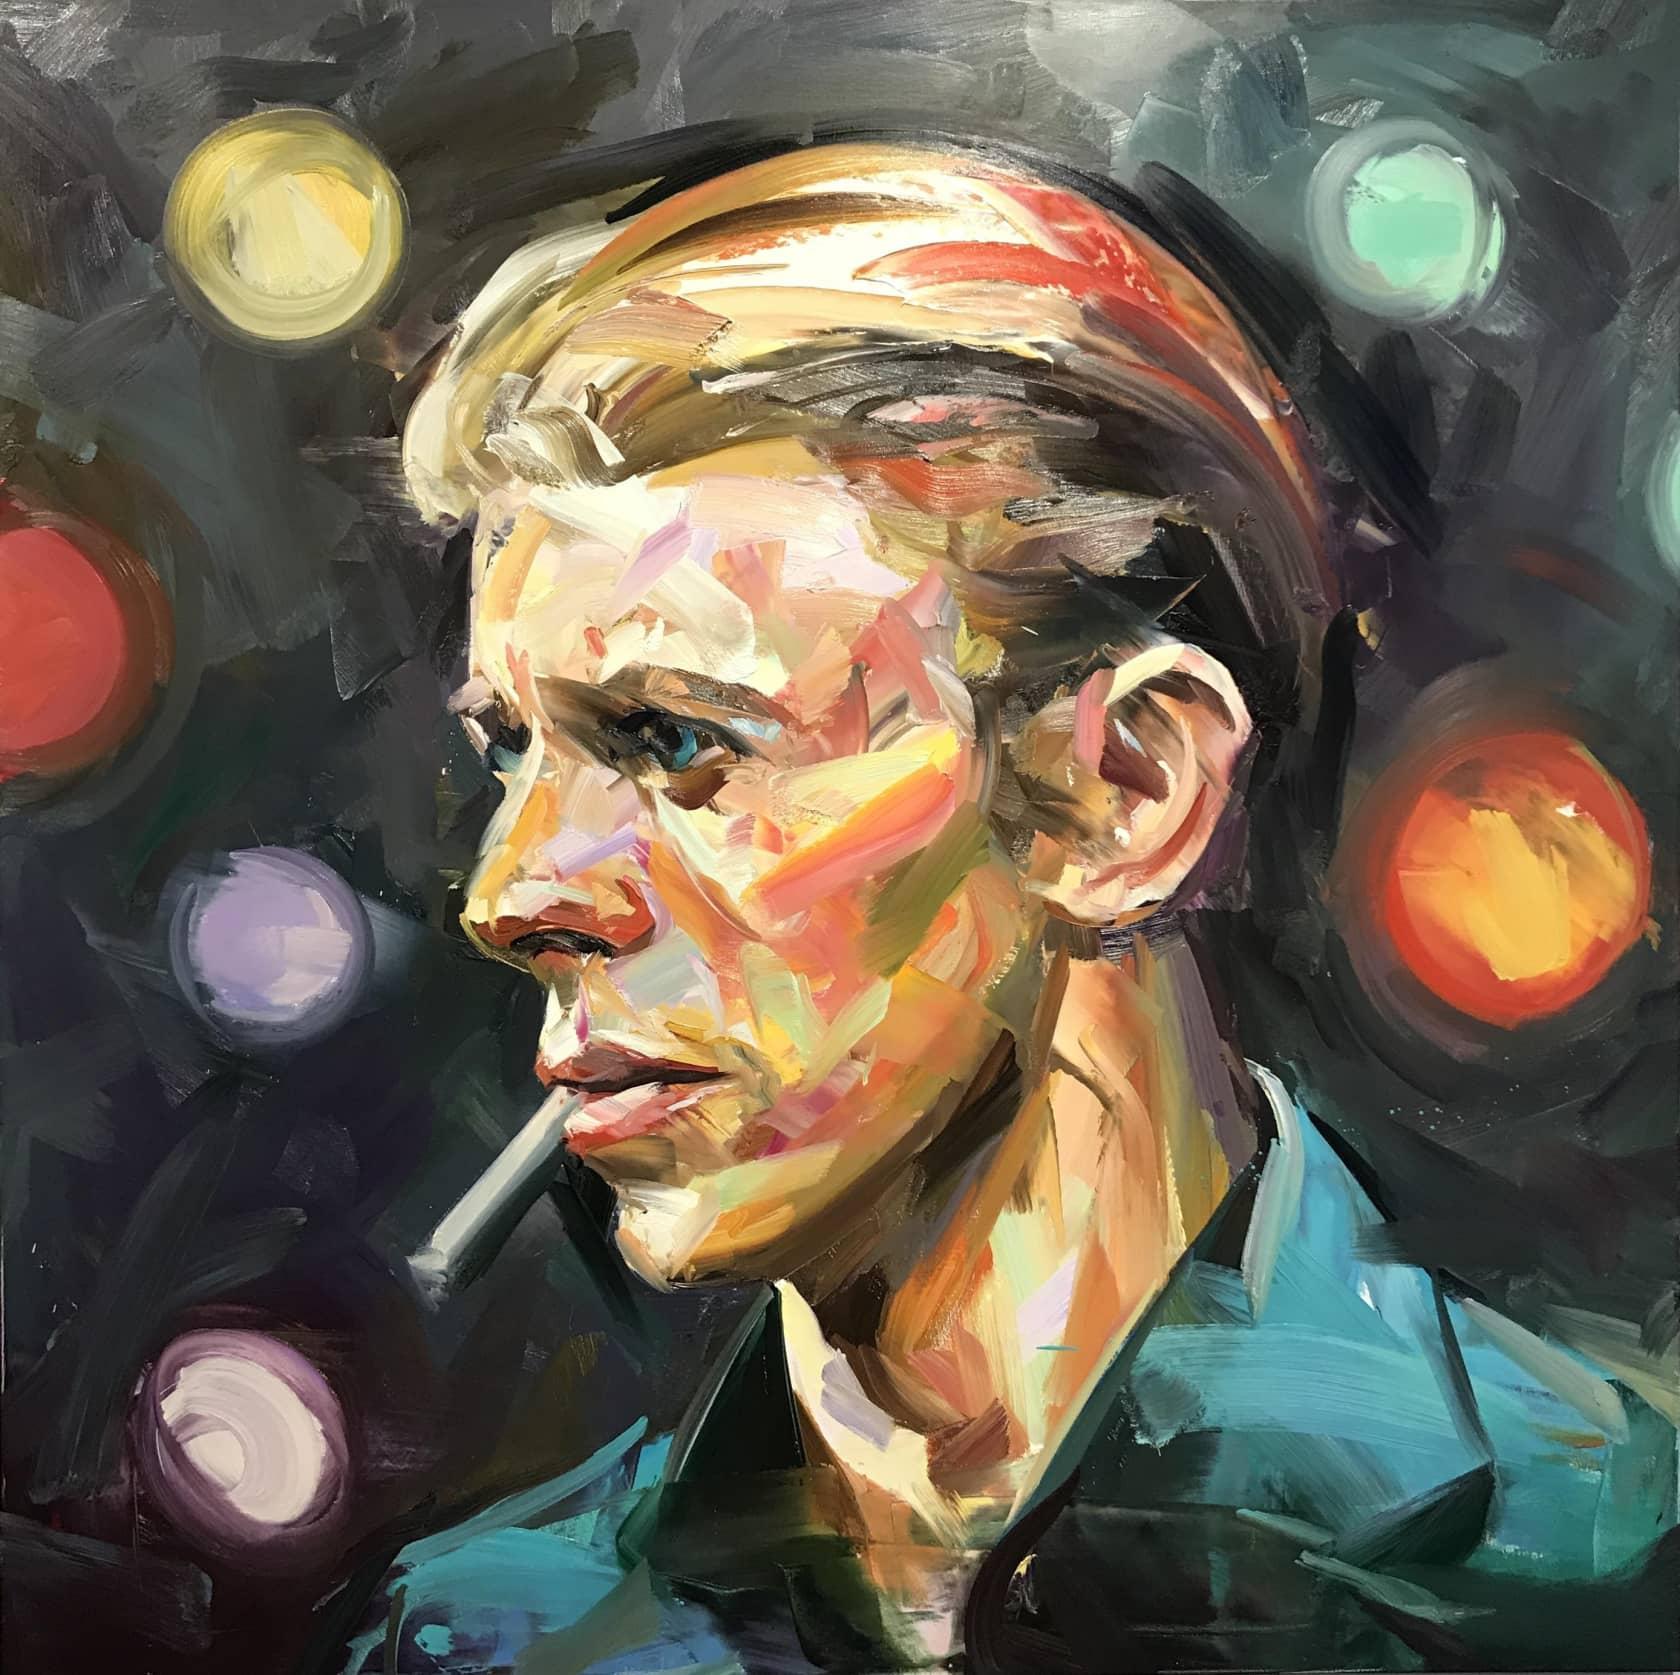 Paul Wright, Bowie Side Profile, 2017